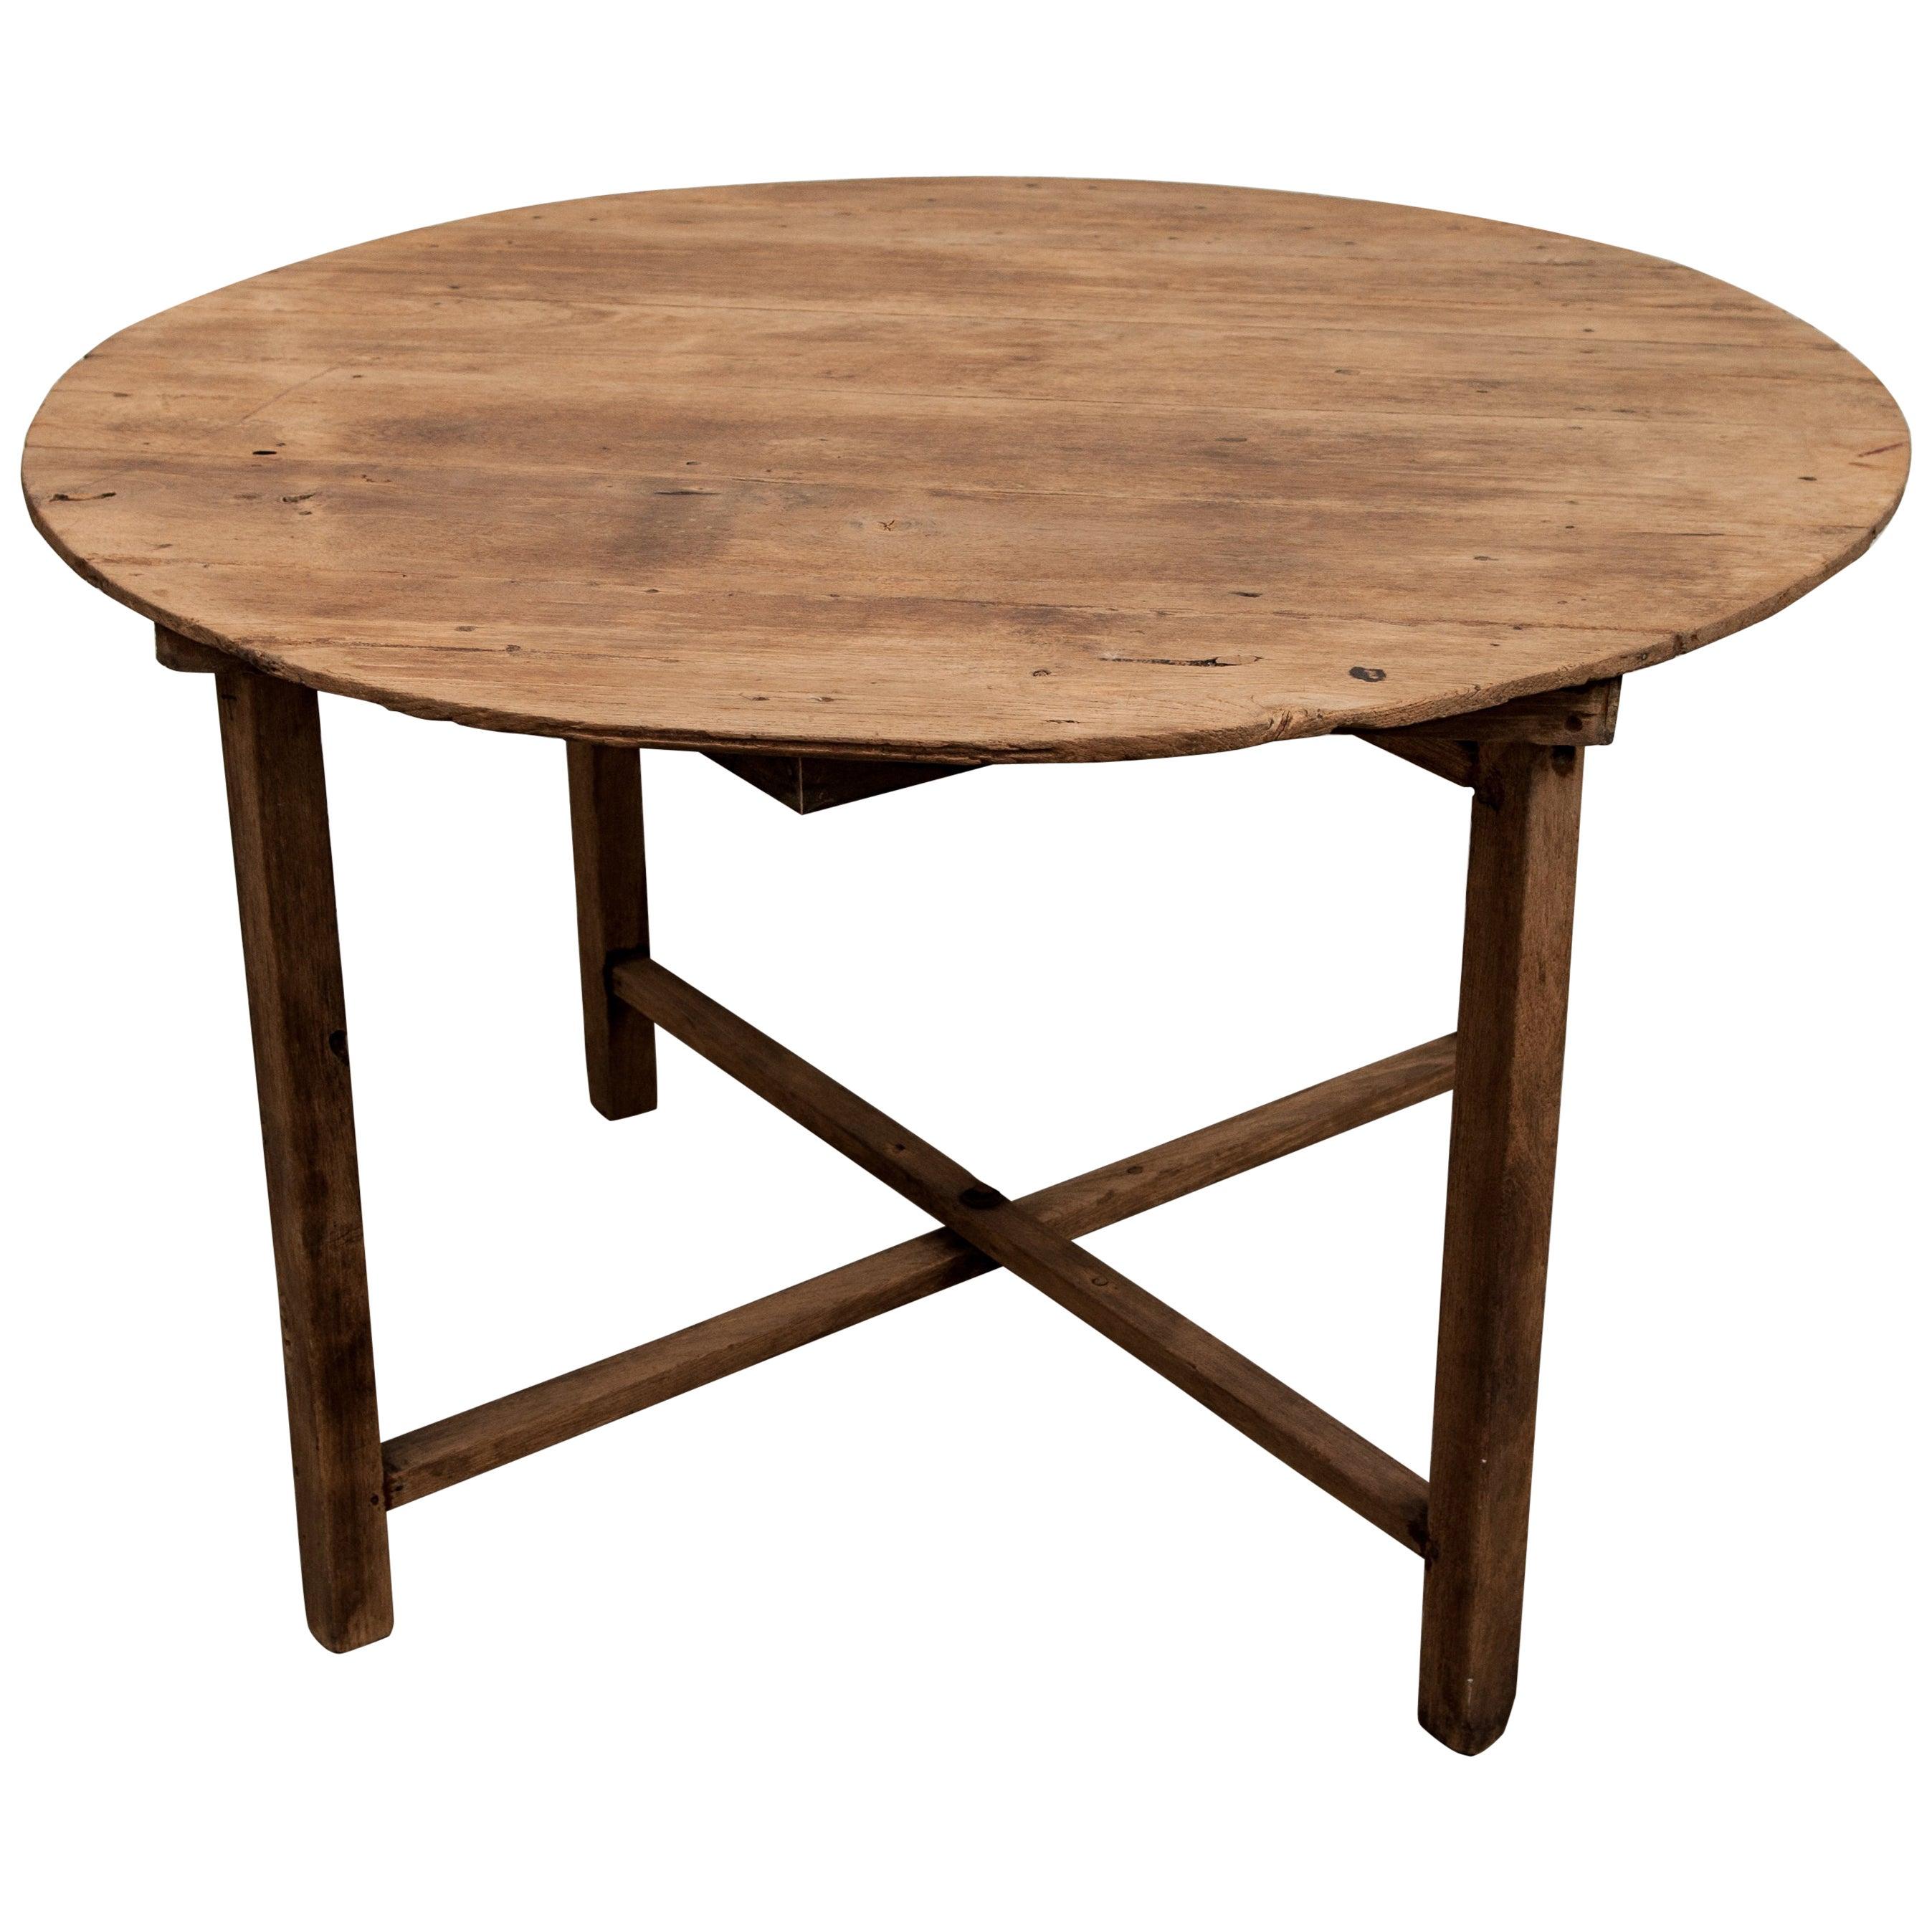 Vintage Teak Round Table / Farm Table From Burma, Mid 20th Century At  1stdibs